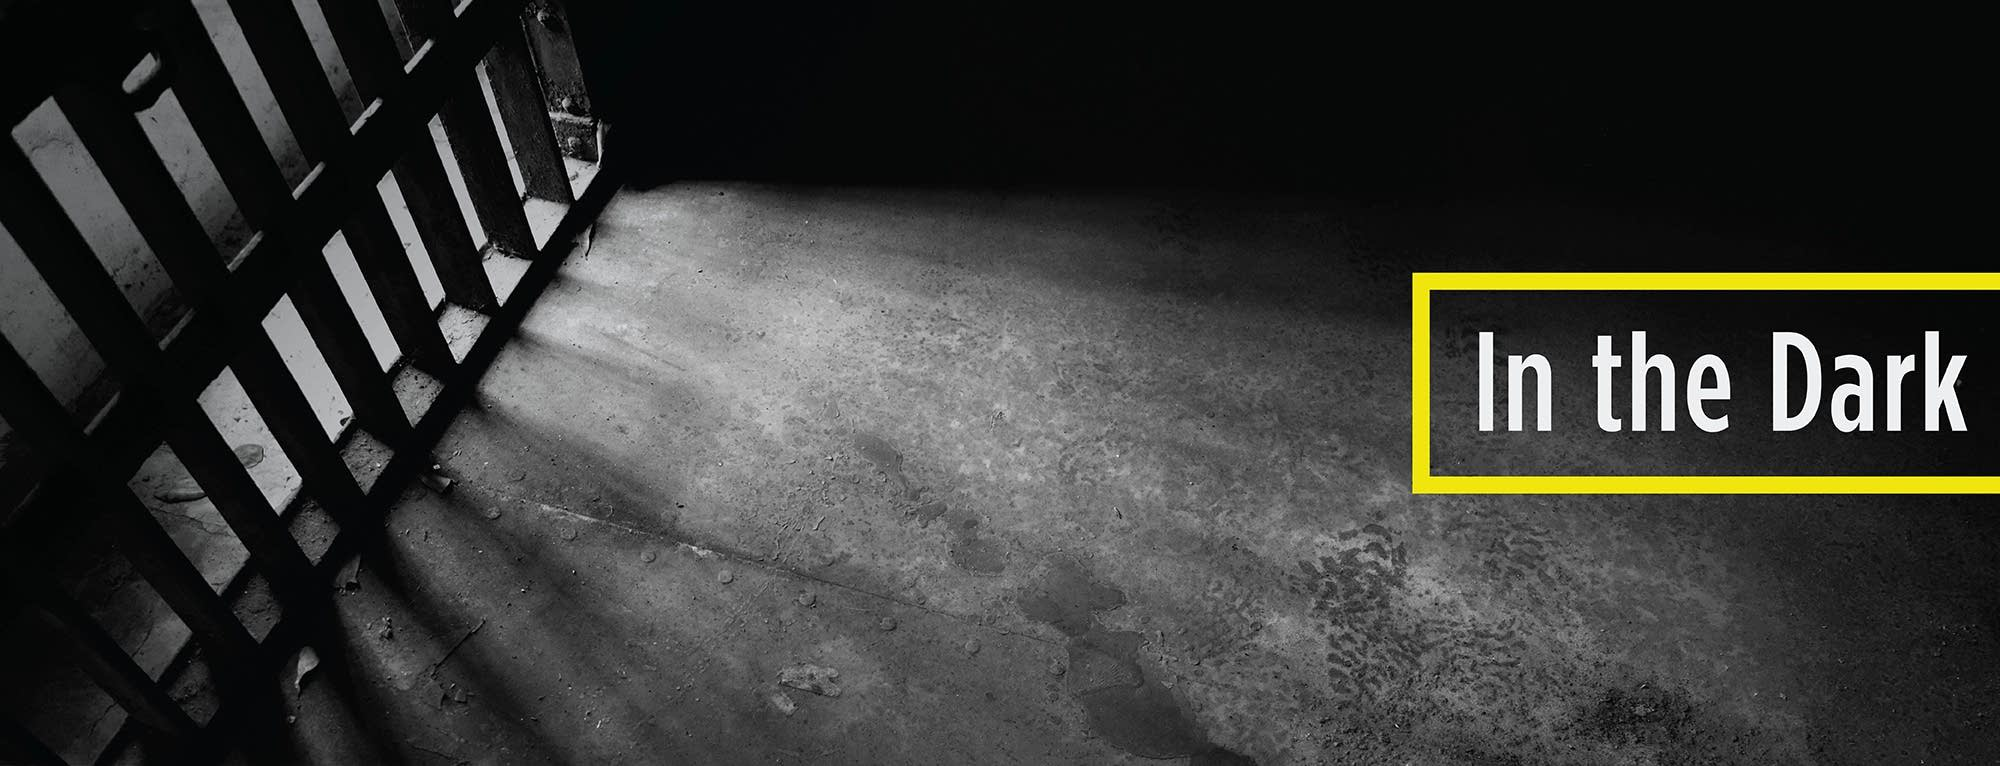 bb476f-20180413-in-the-dark.jpg